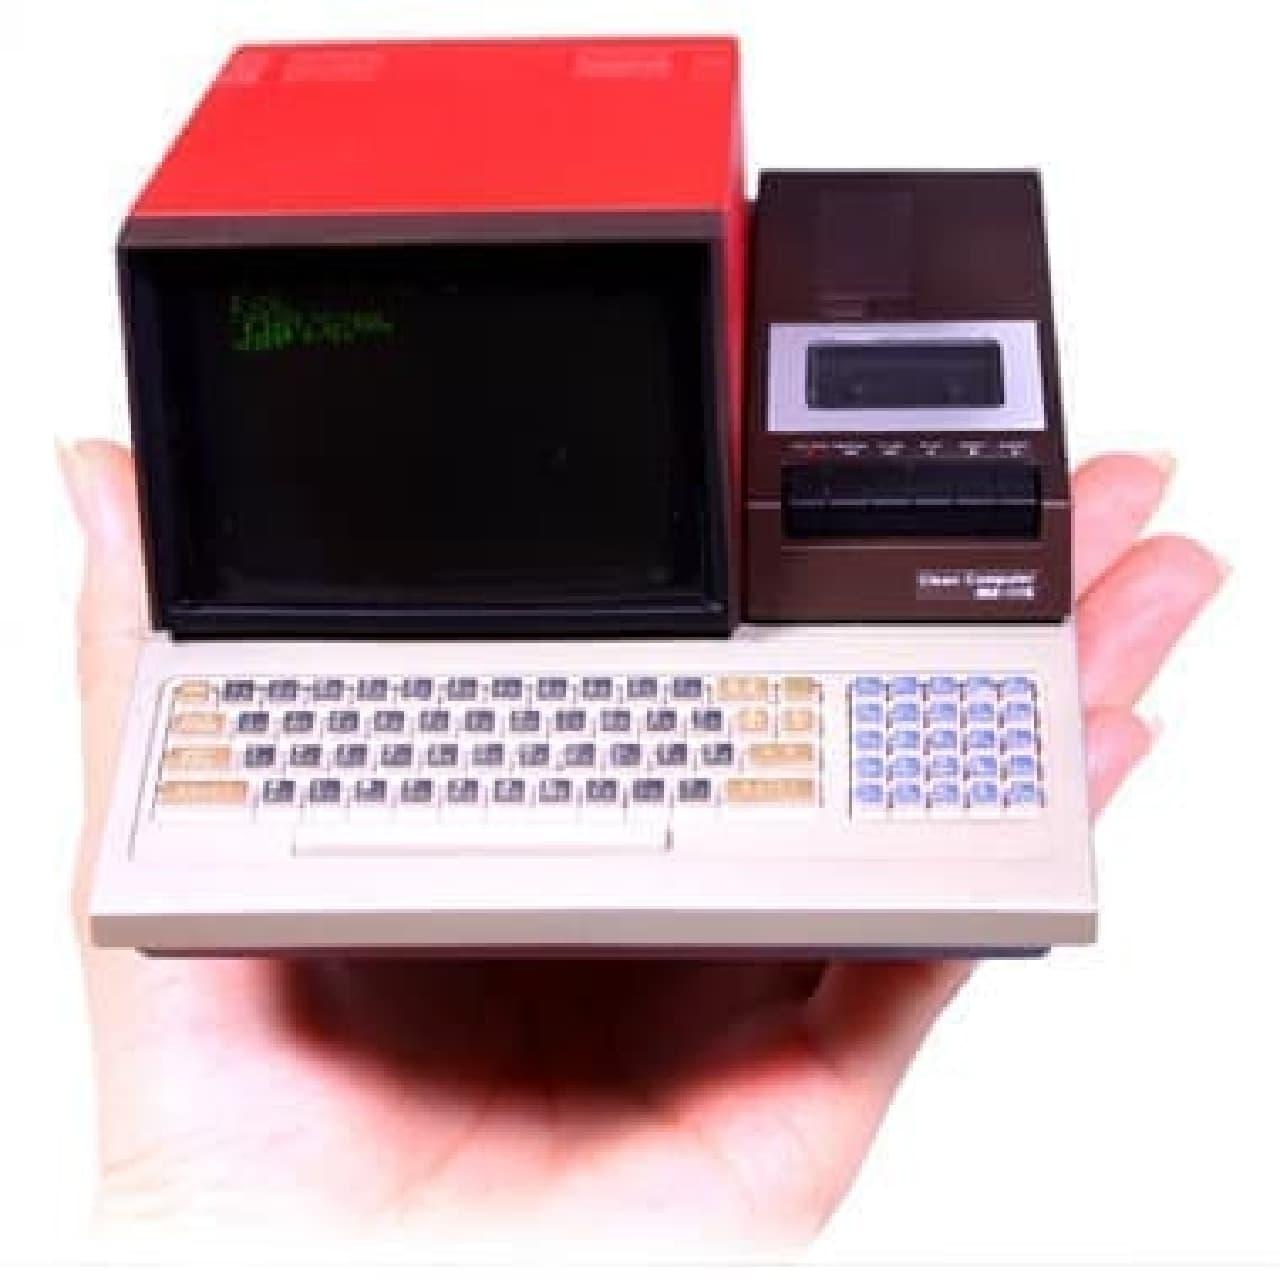 MZ-80Cを再現した「PasocomMini MZ-80C」